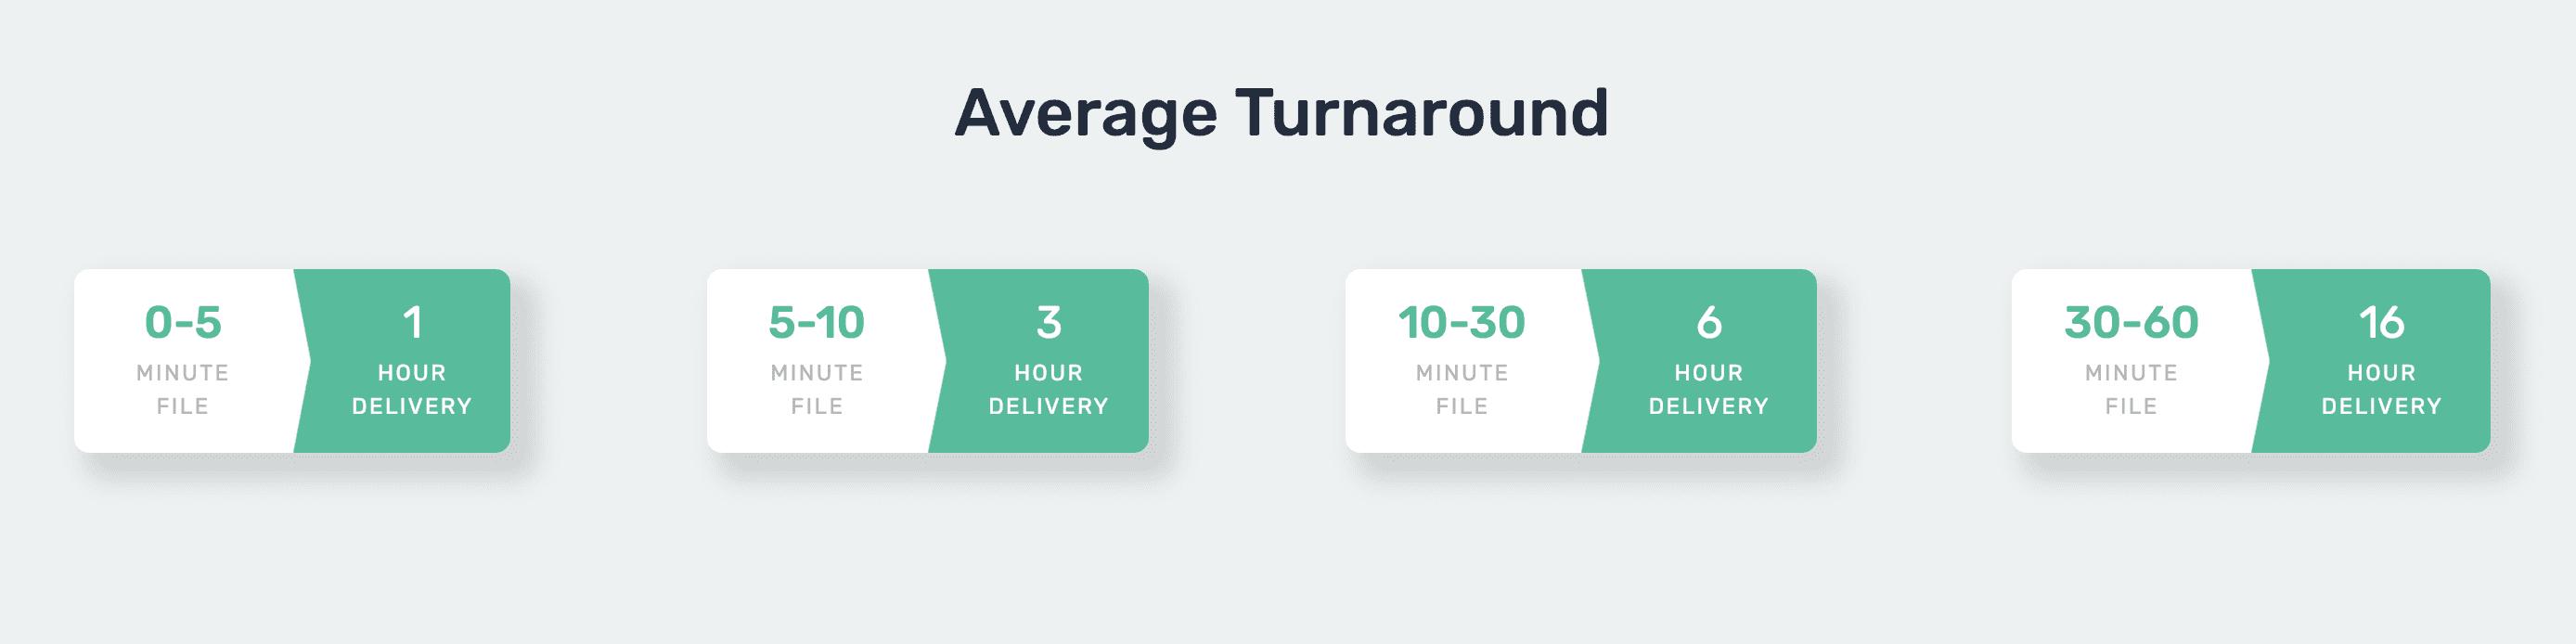 Average turnaround time for captions rev